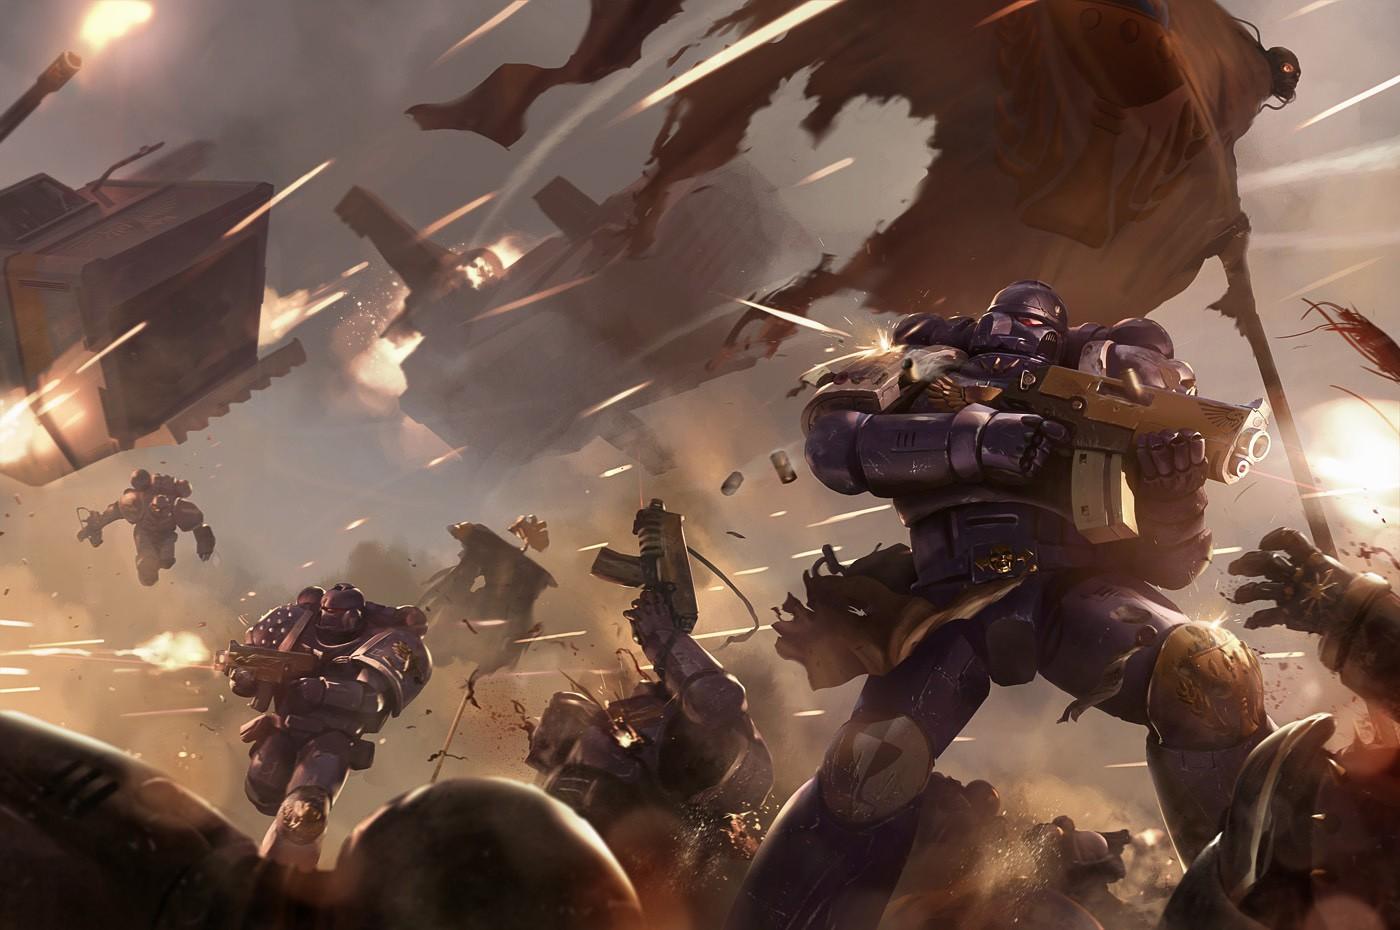 [W40K] Collection d'images : Warhammer 40K divers et inclassables - Page 2 Black_10